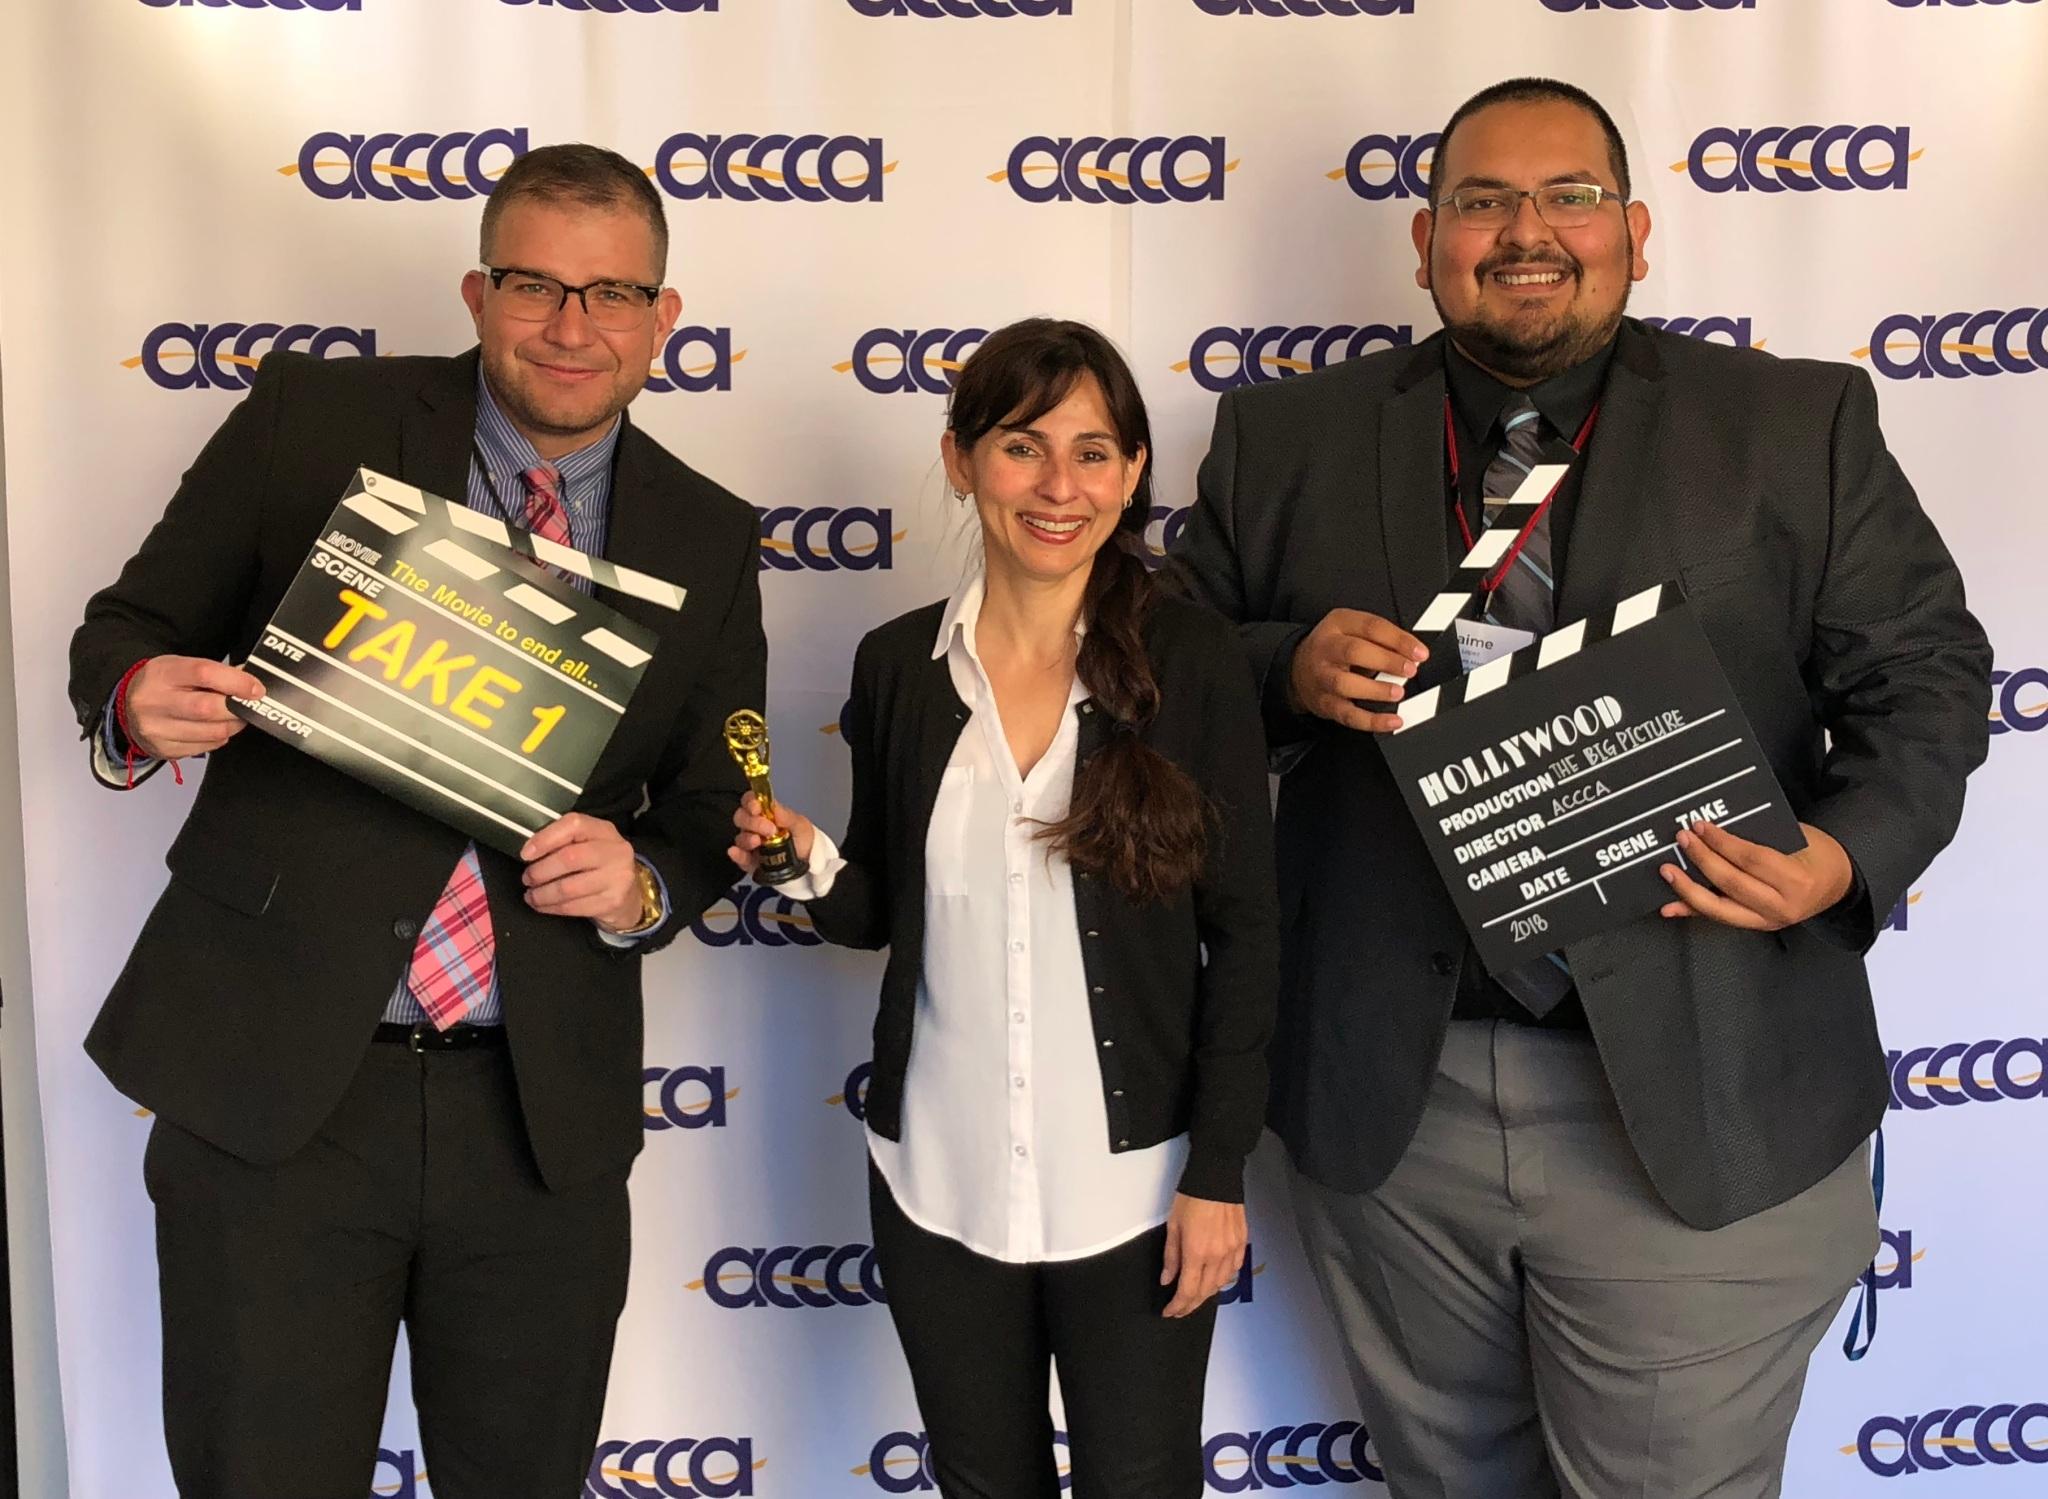 Gustavo Enrique, Sonya Christian, Jaime Lopez Feb 21 2018